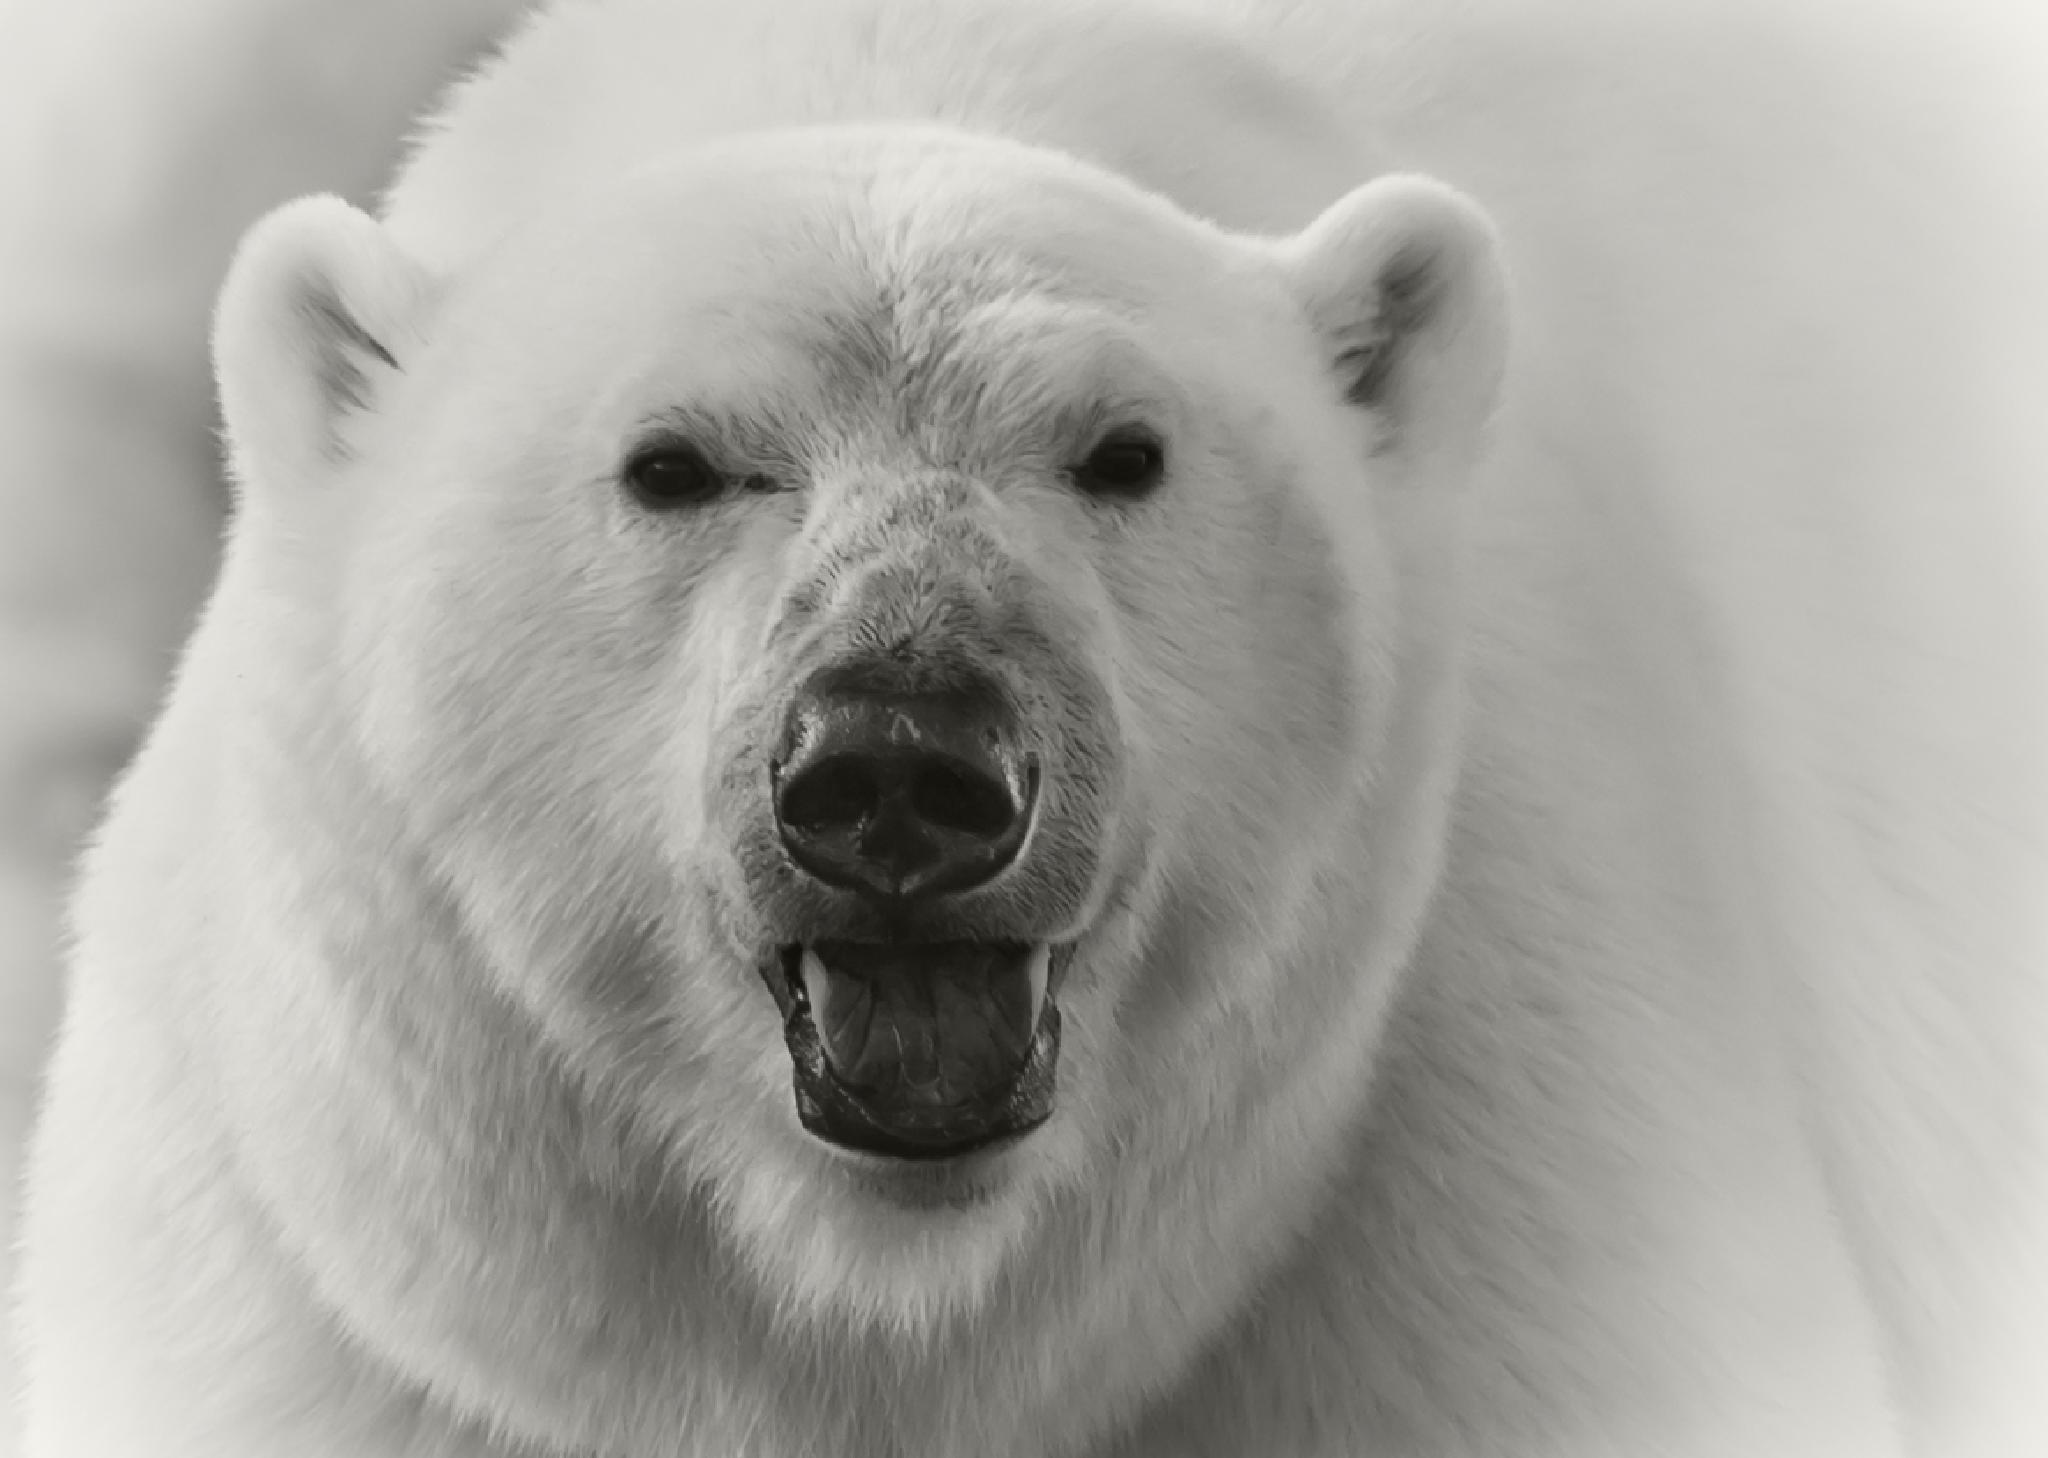 Polarbear by Aashild Dordal